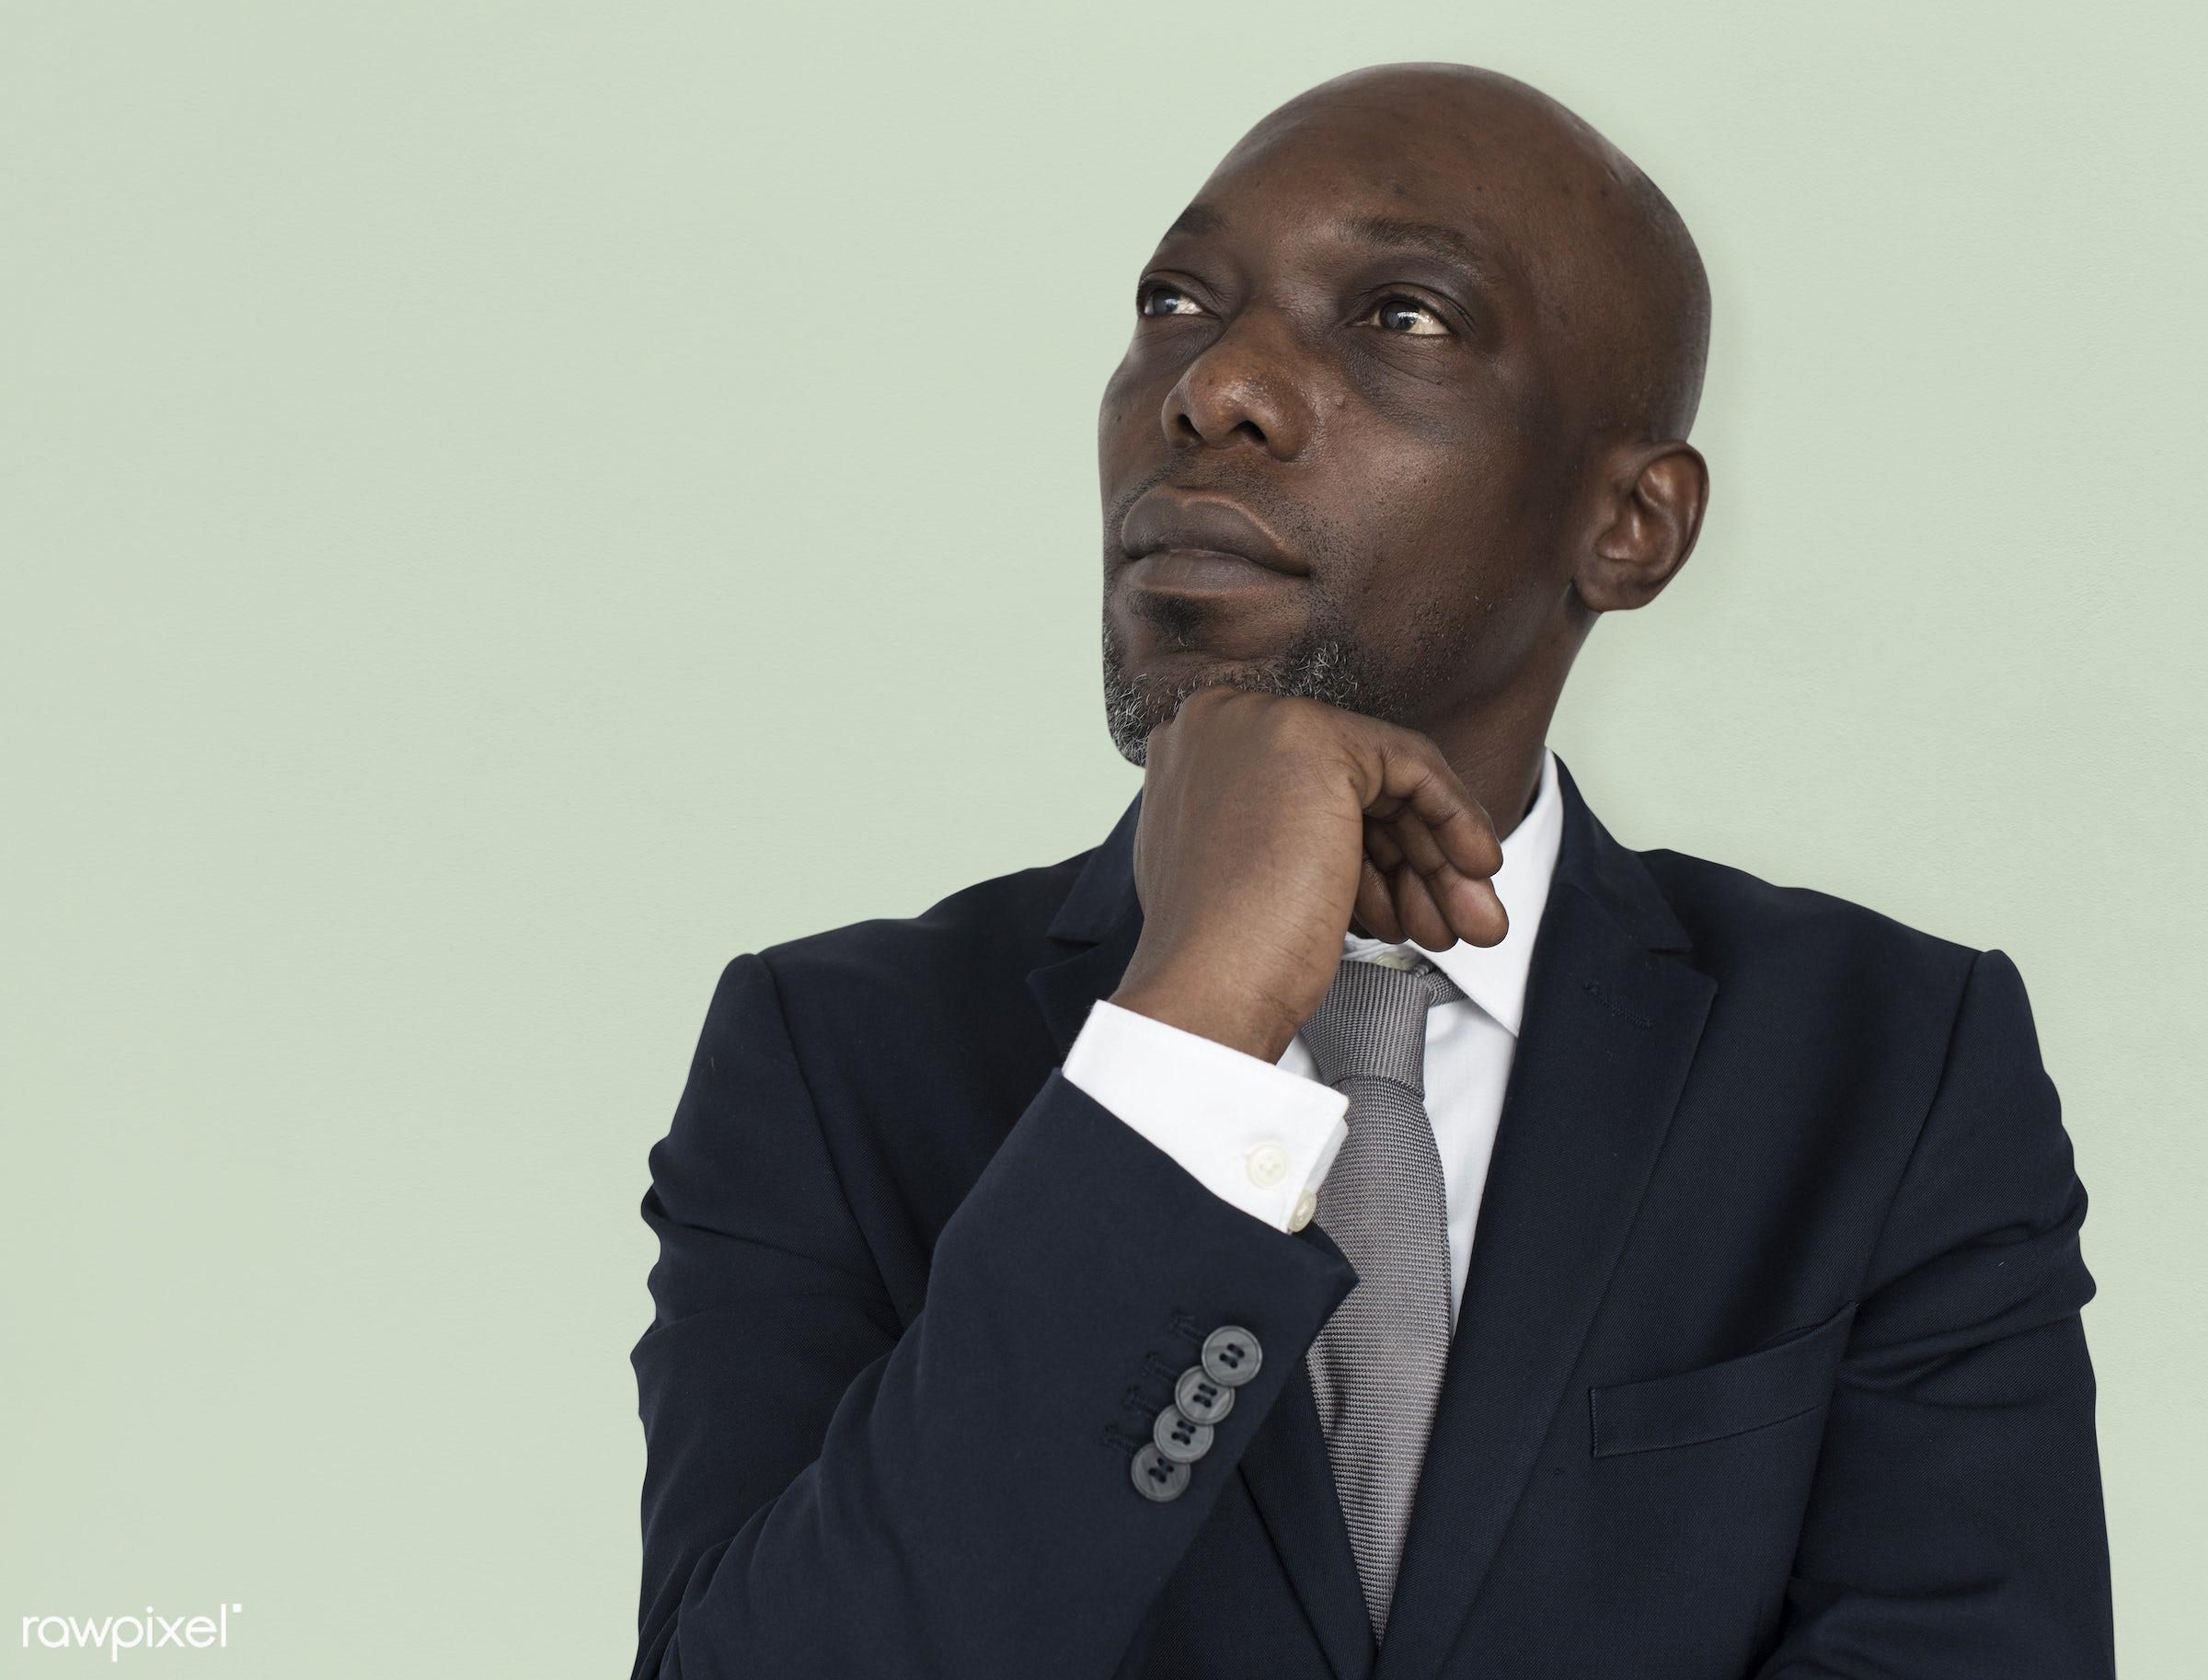 black, african, african american, professional, suit, tie, business, businessman, portrait, man, male